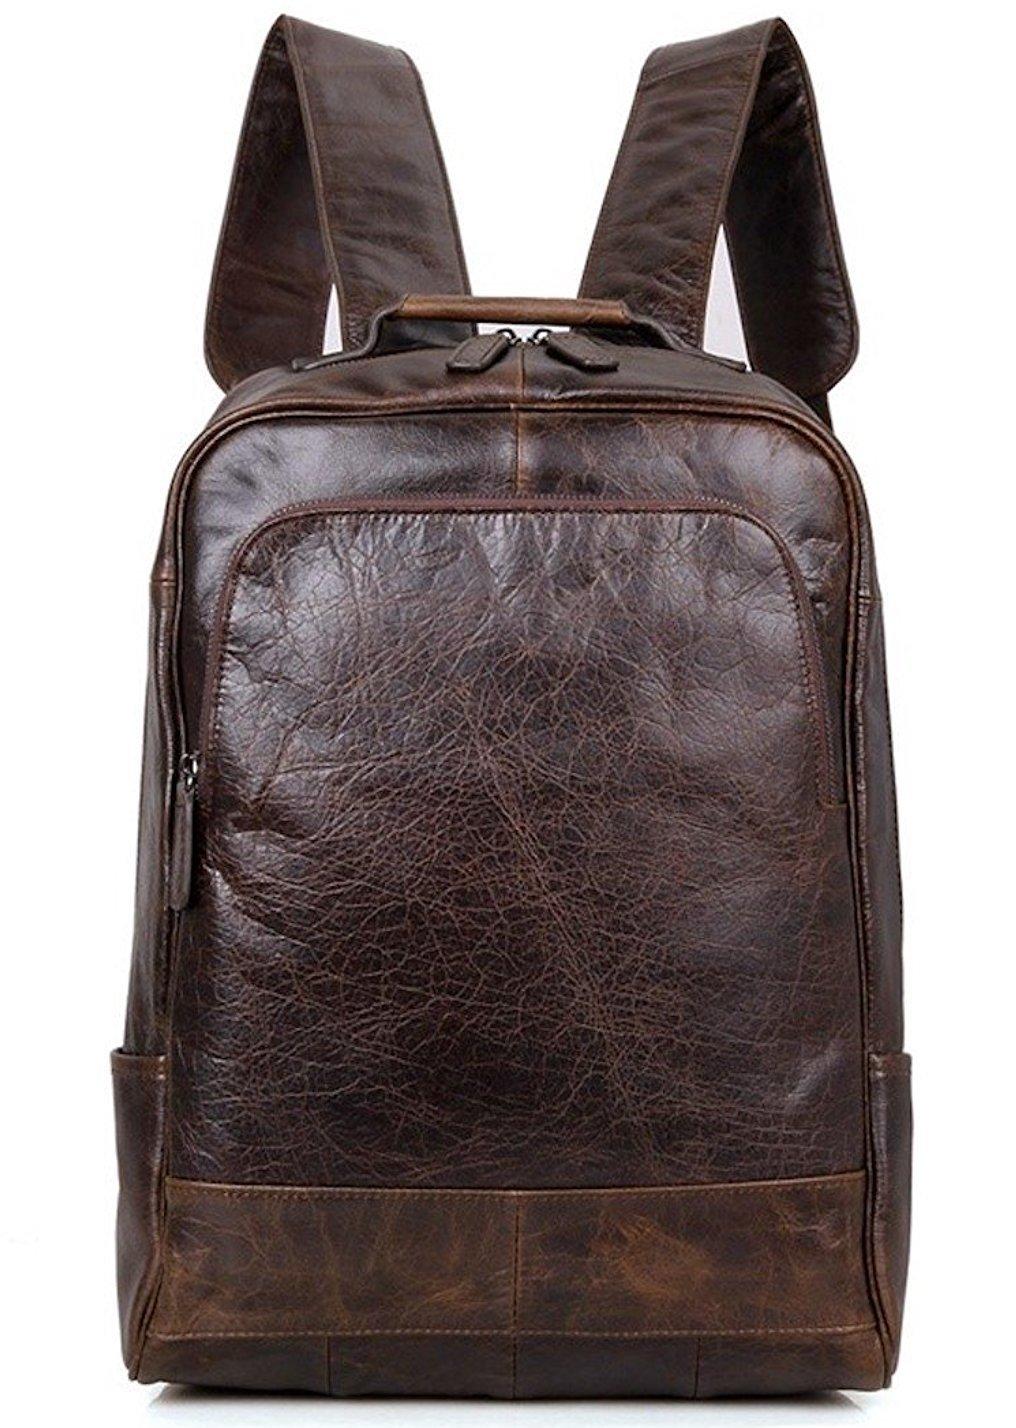 Clean Vintage Men's Fashion Leather Backpack- Fits 15'' Laptops - Slim Design Italian Leather College Business Rucksacks for Men (Dark Brown)